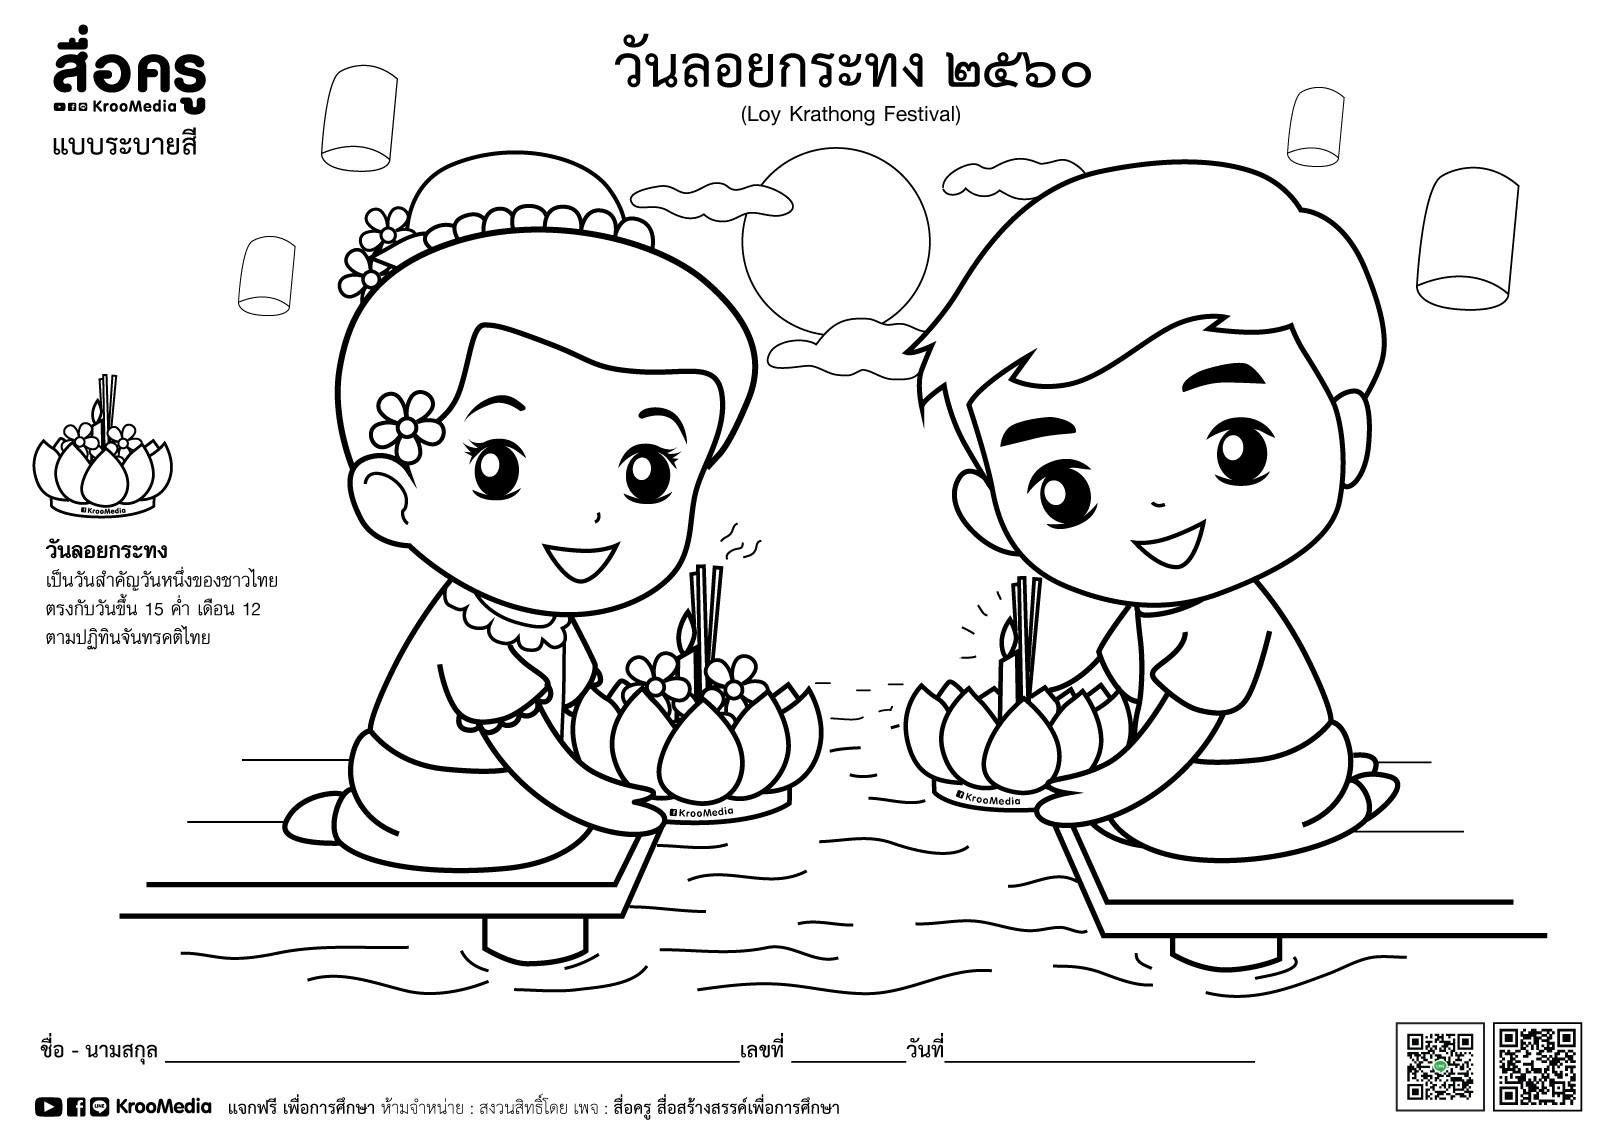 loy krathong coloring pages - photo#7